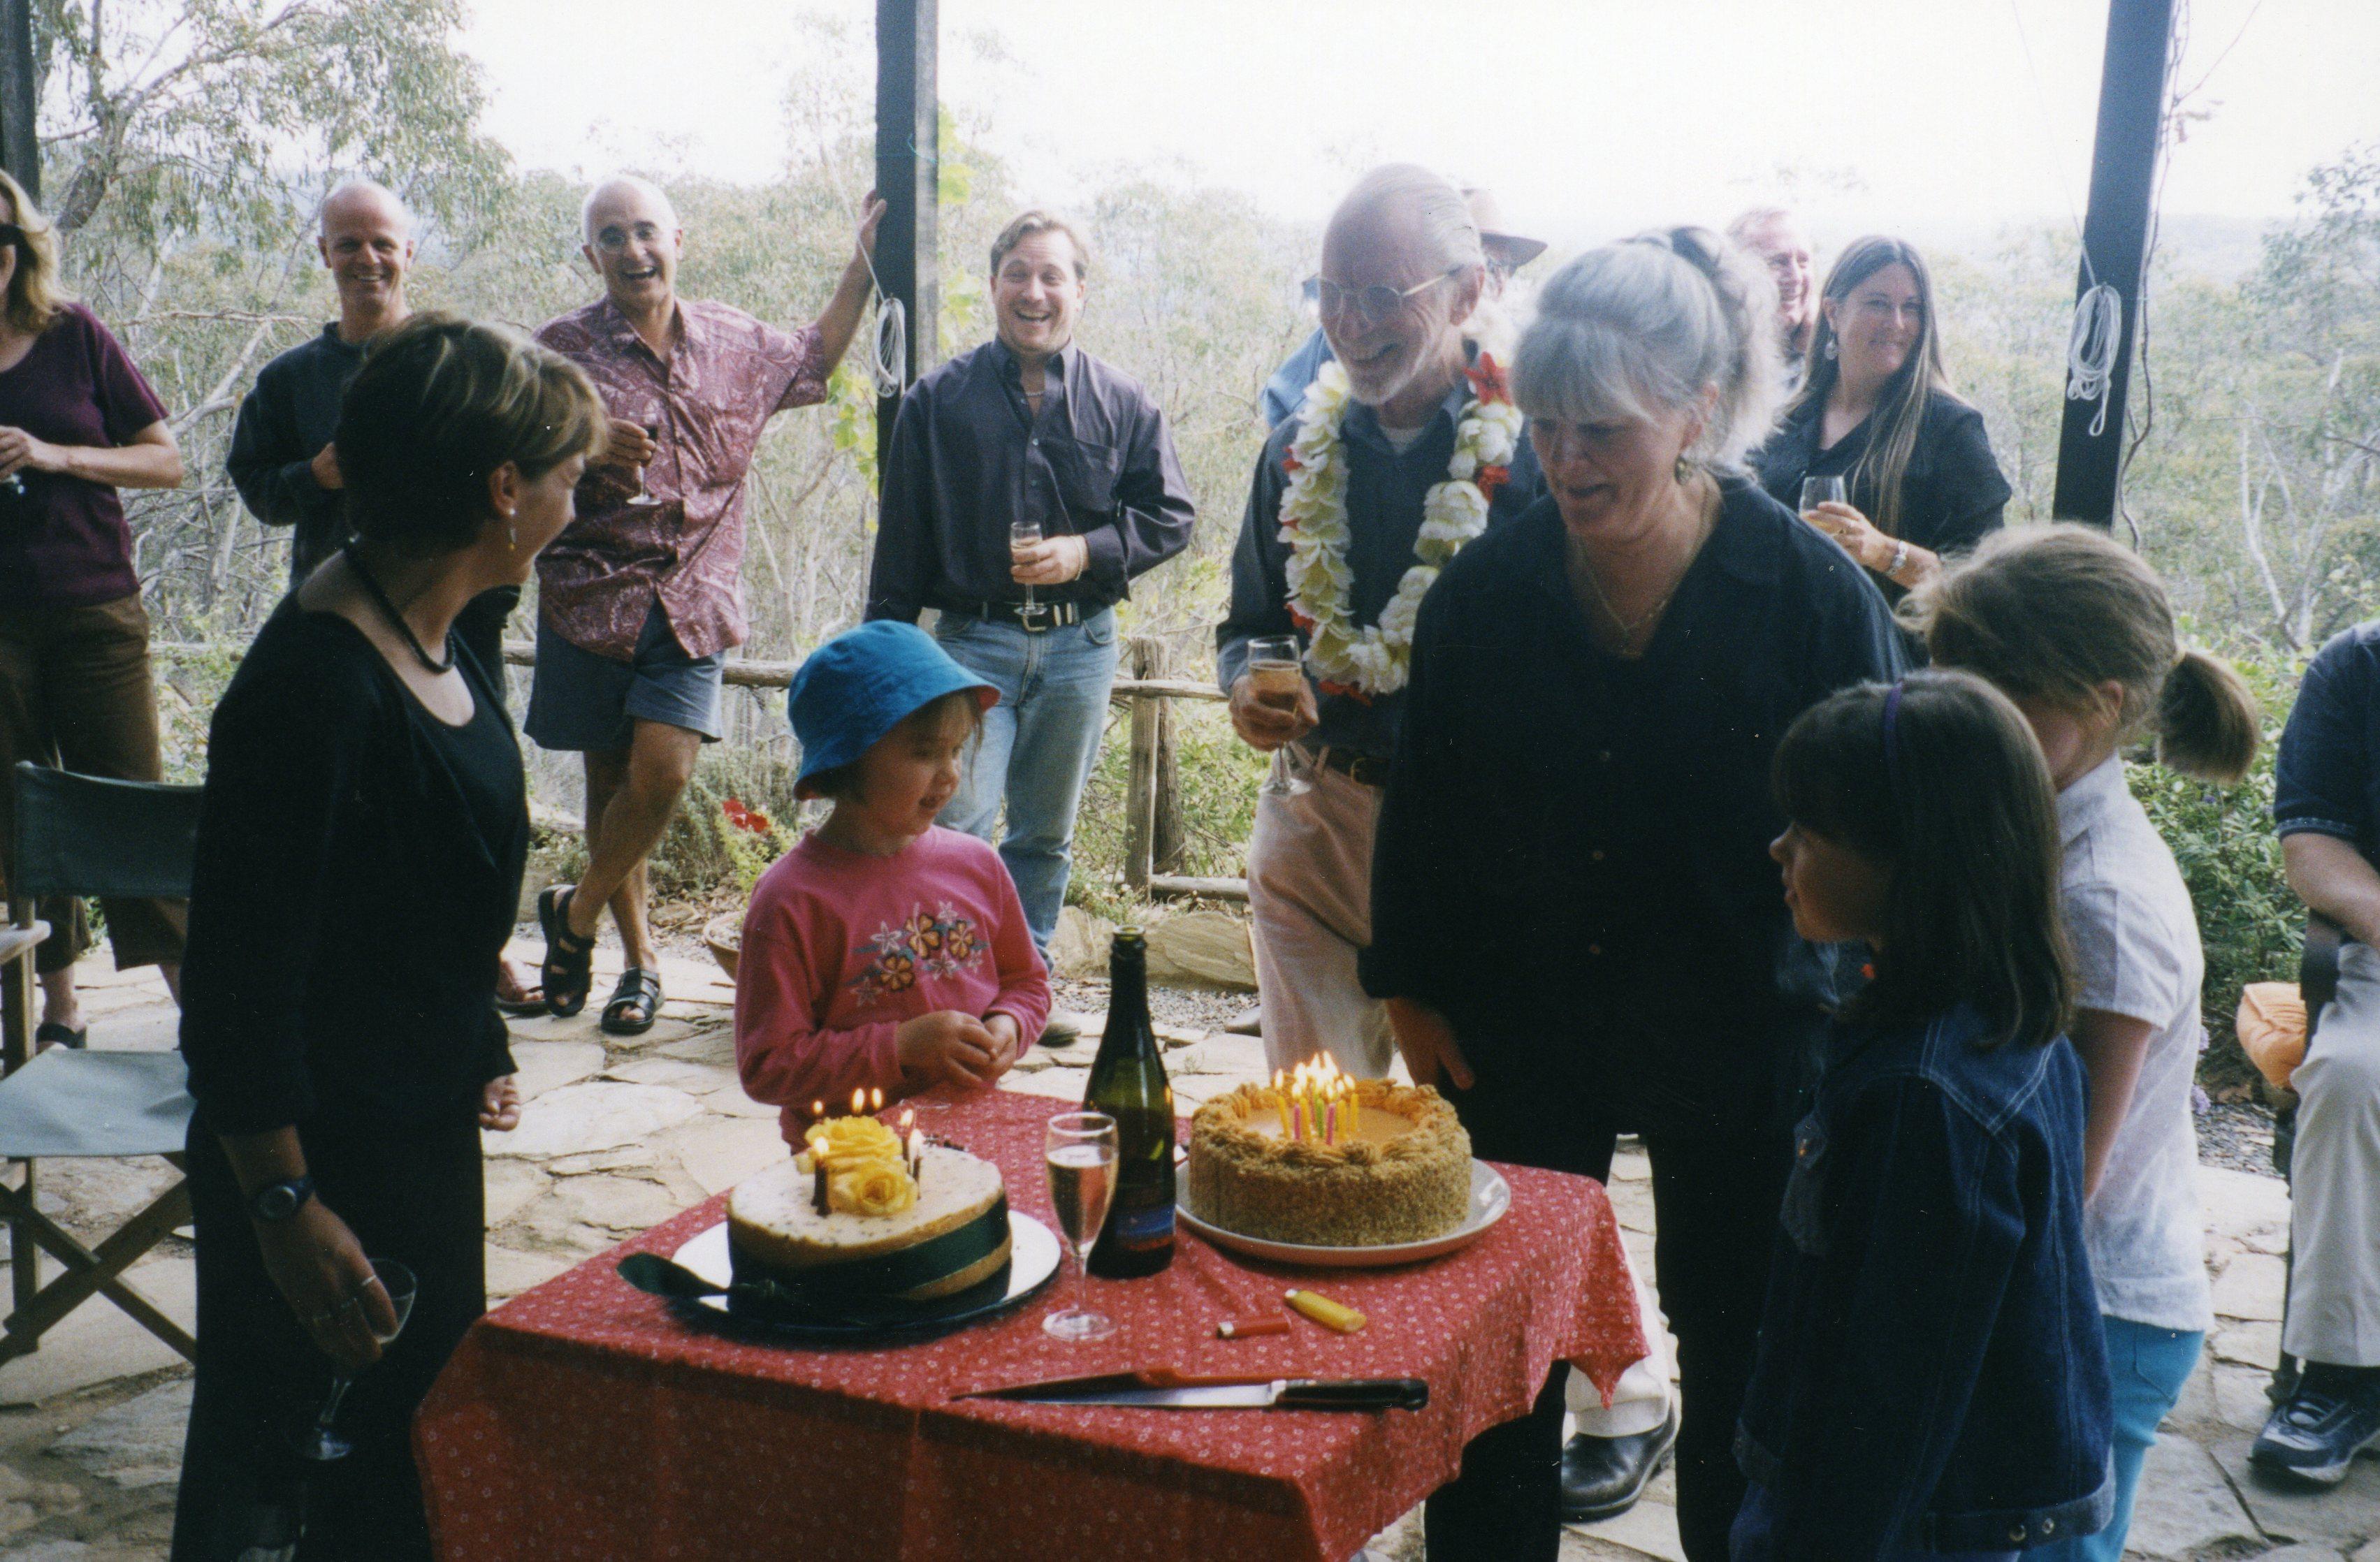 a party